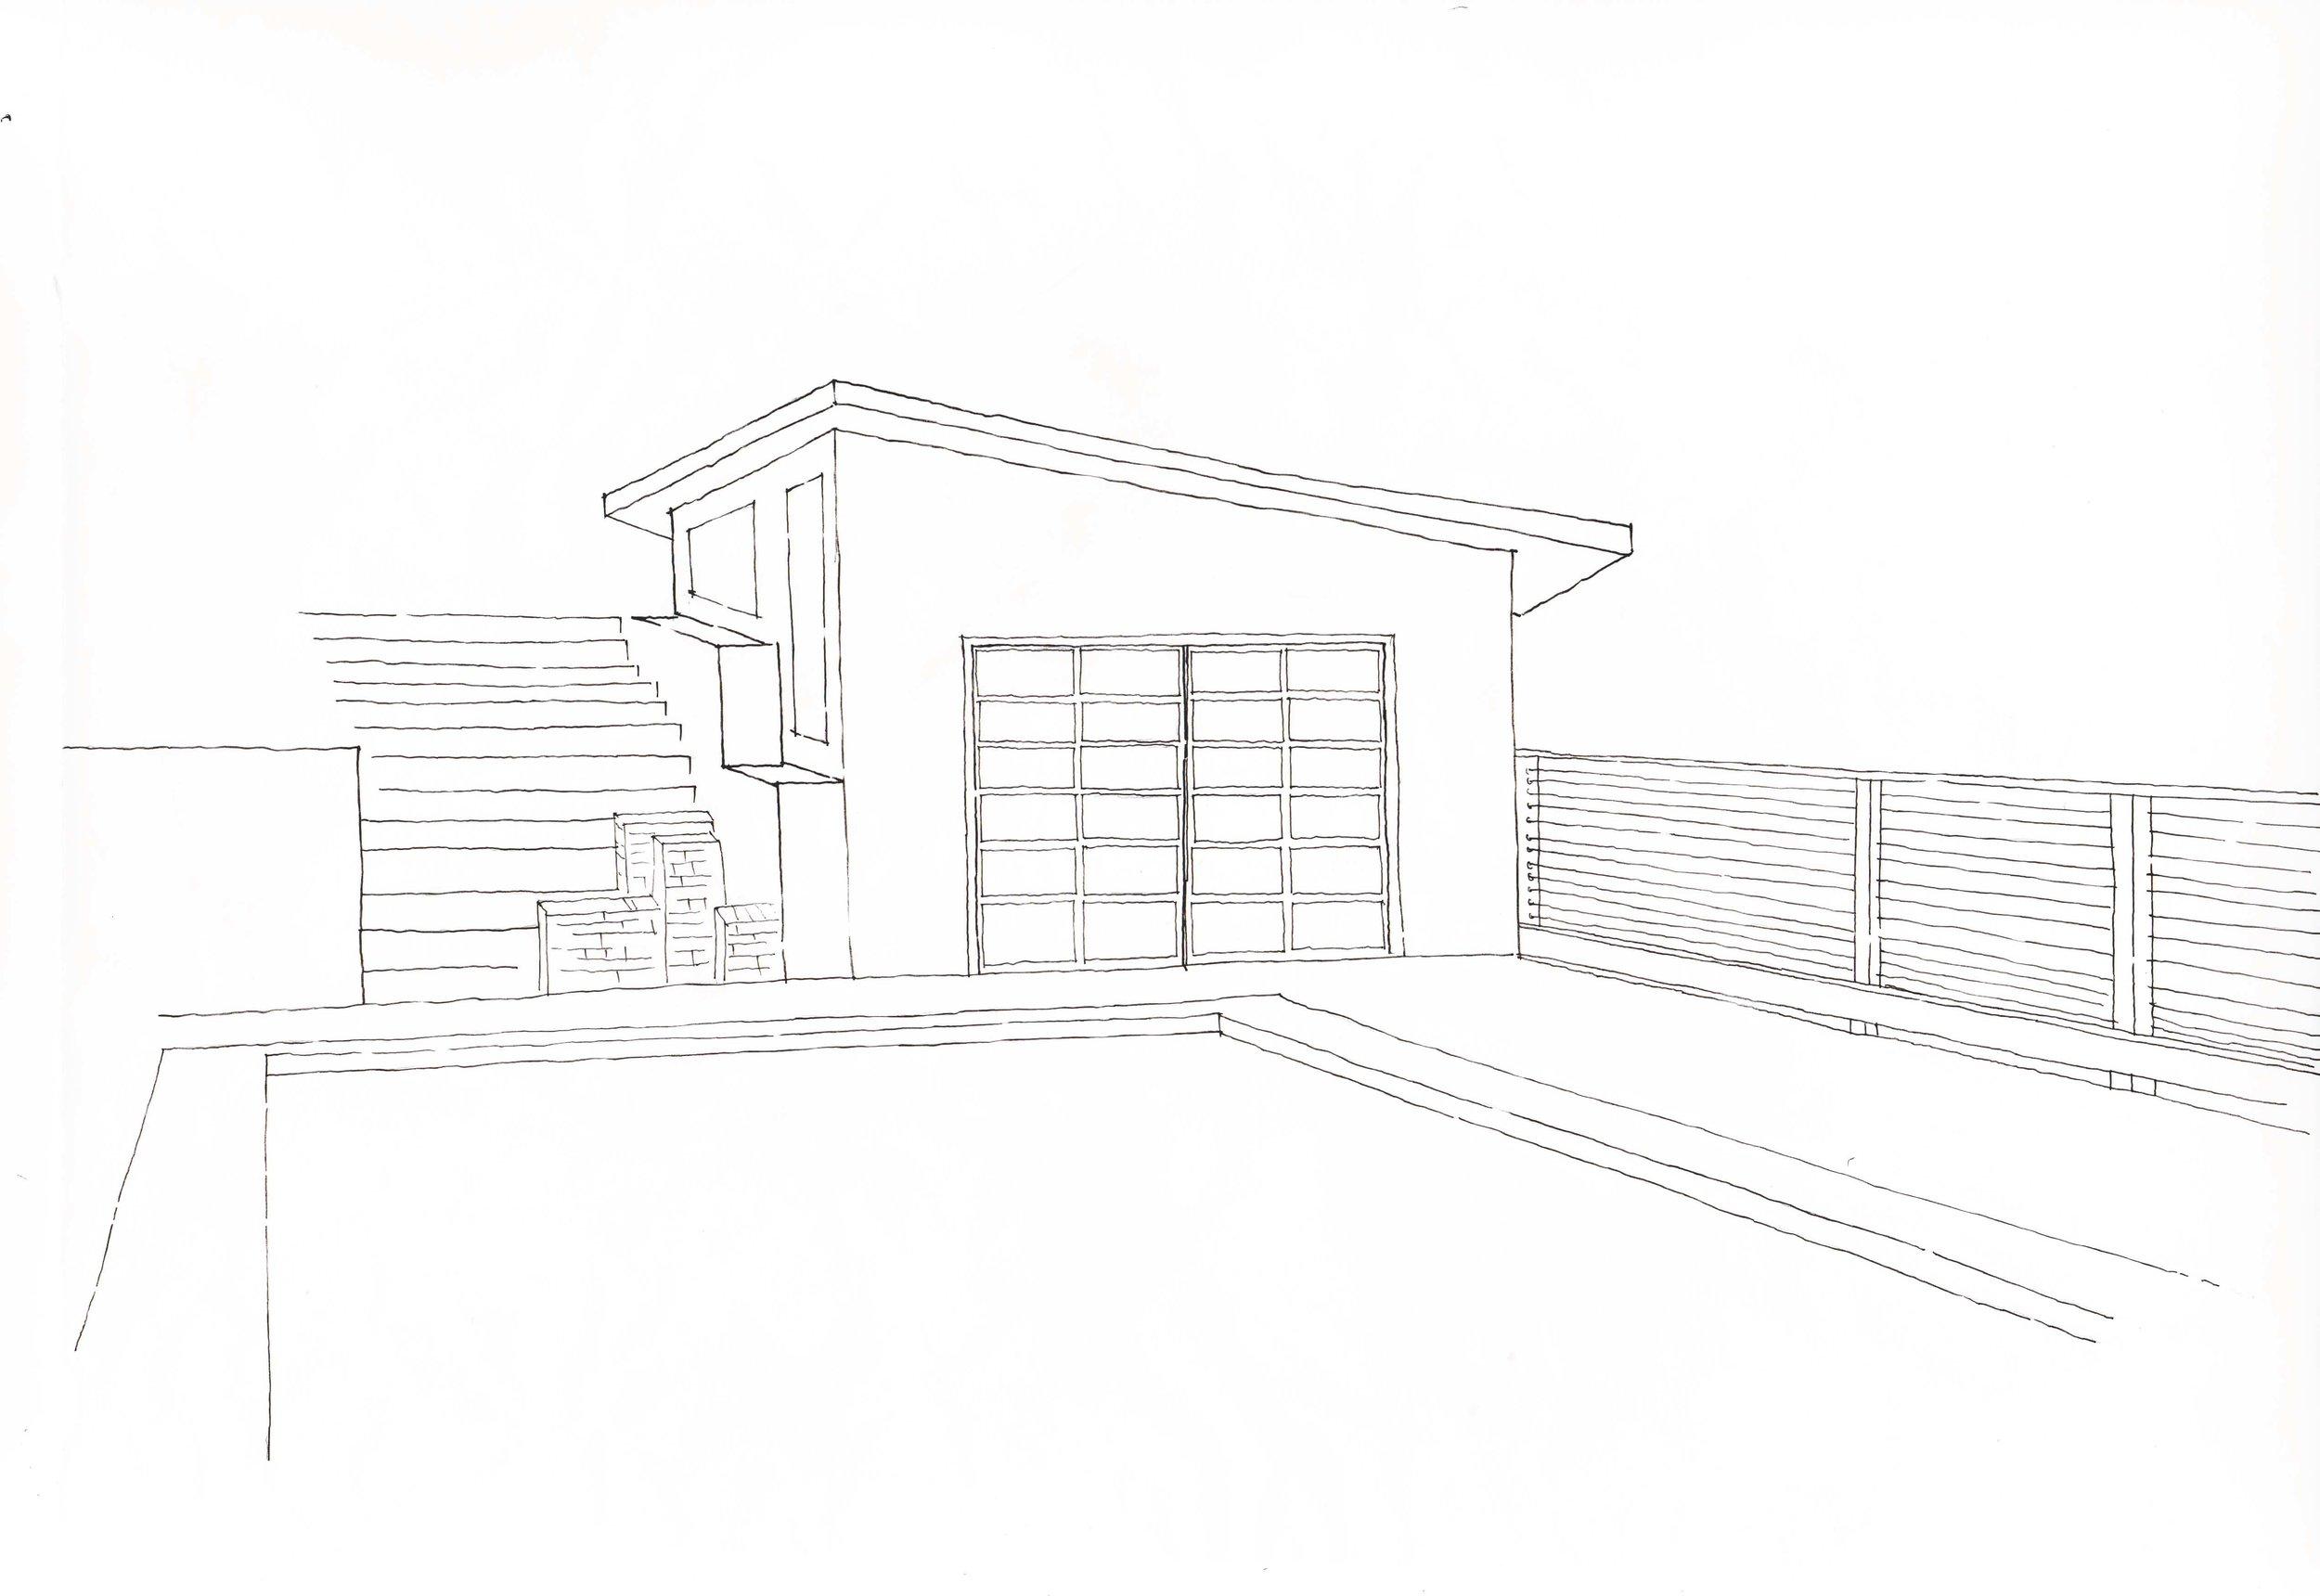 Pool House 3 rev 1.jpg